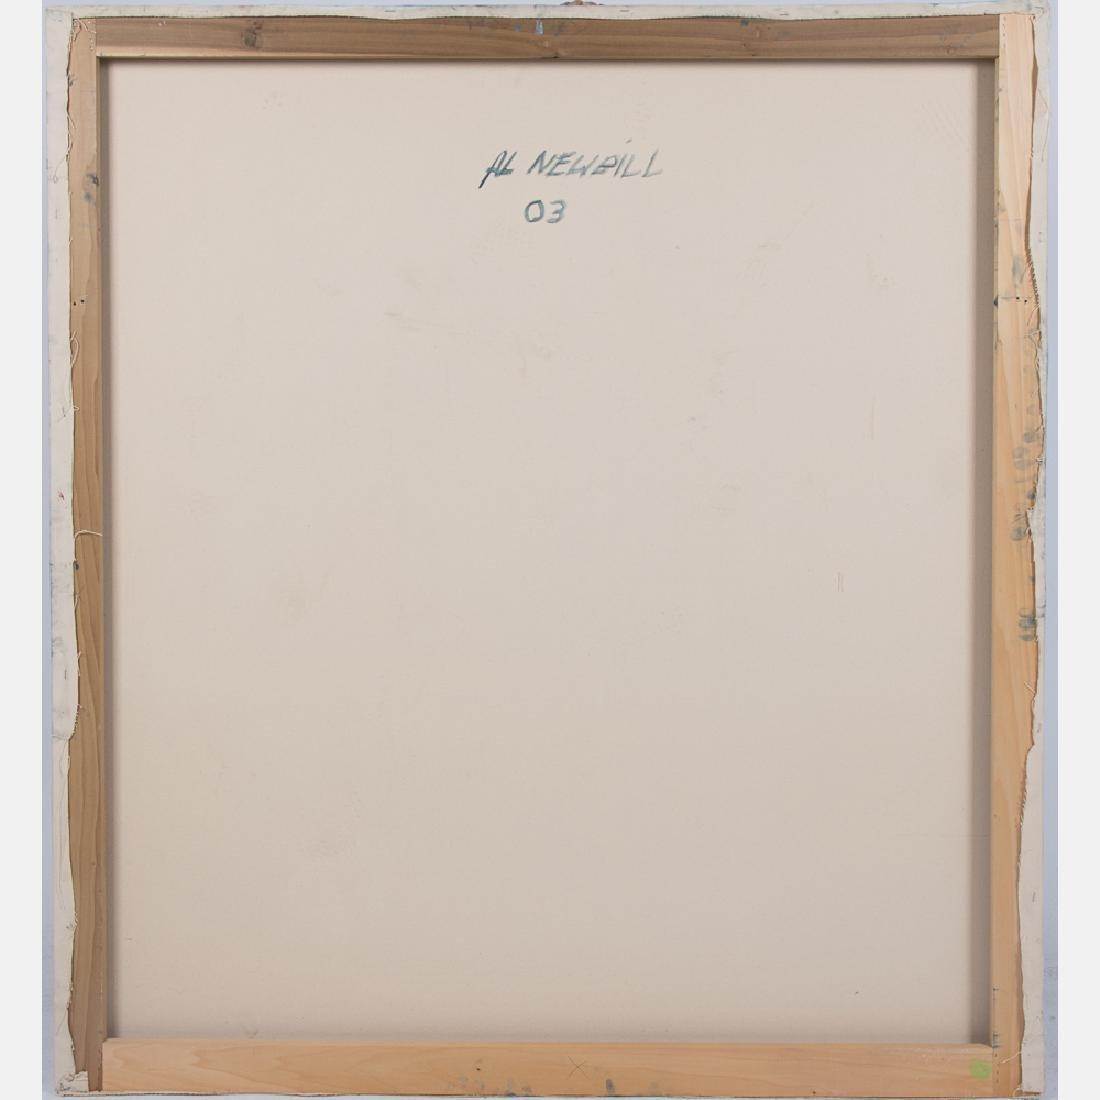 Al Newbill (1921-2012) Untitled, Oil on canvas, - 2